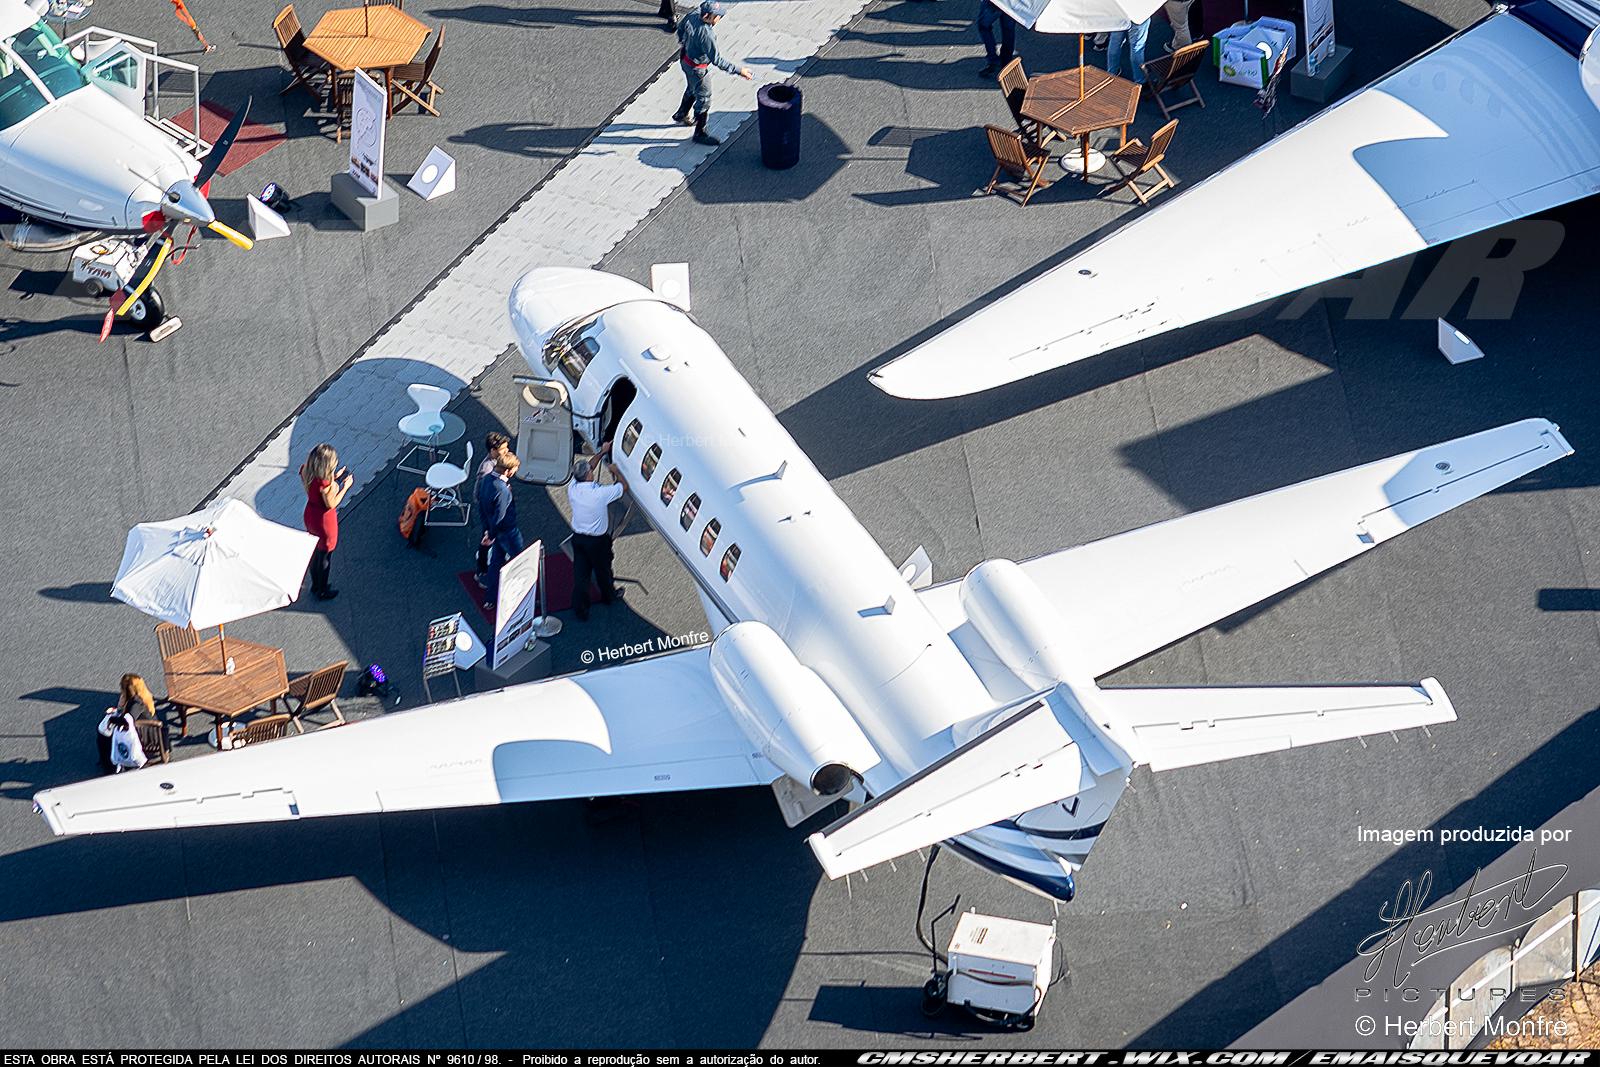 Cessna Citation CJ3+ | N532CJ | Foto © Herbert Monfre - Contrate o fotógrafo em cmsherbert@hotmail.com | by É MAIS QUE VOAR | LABACE 2019